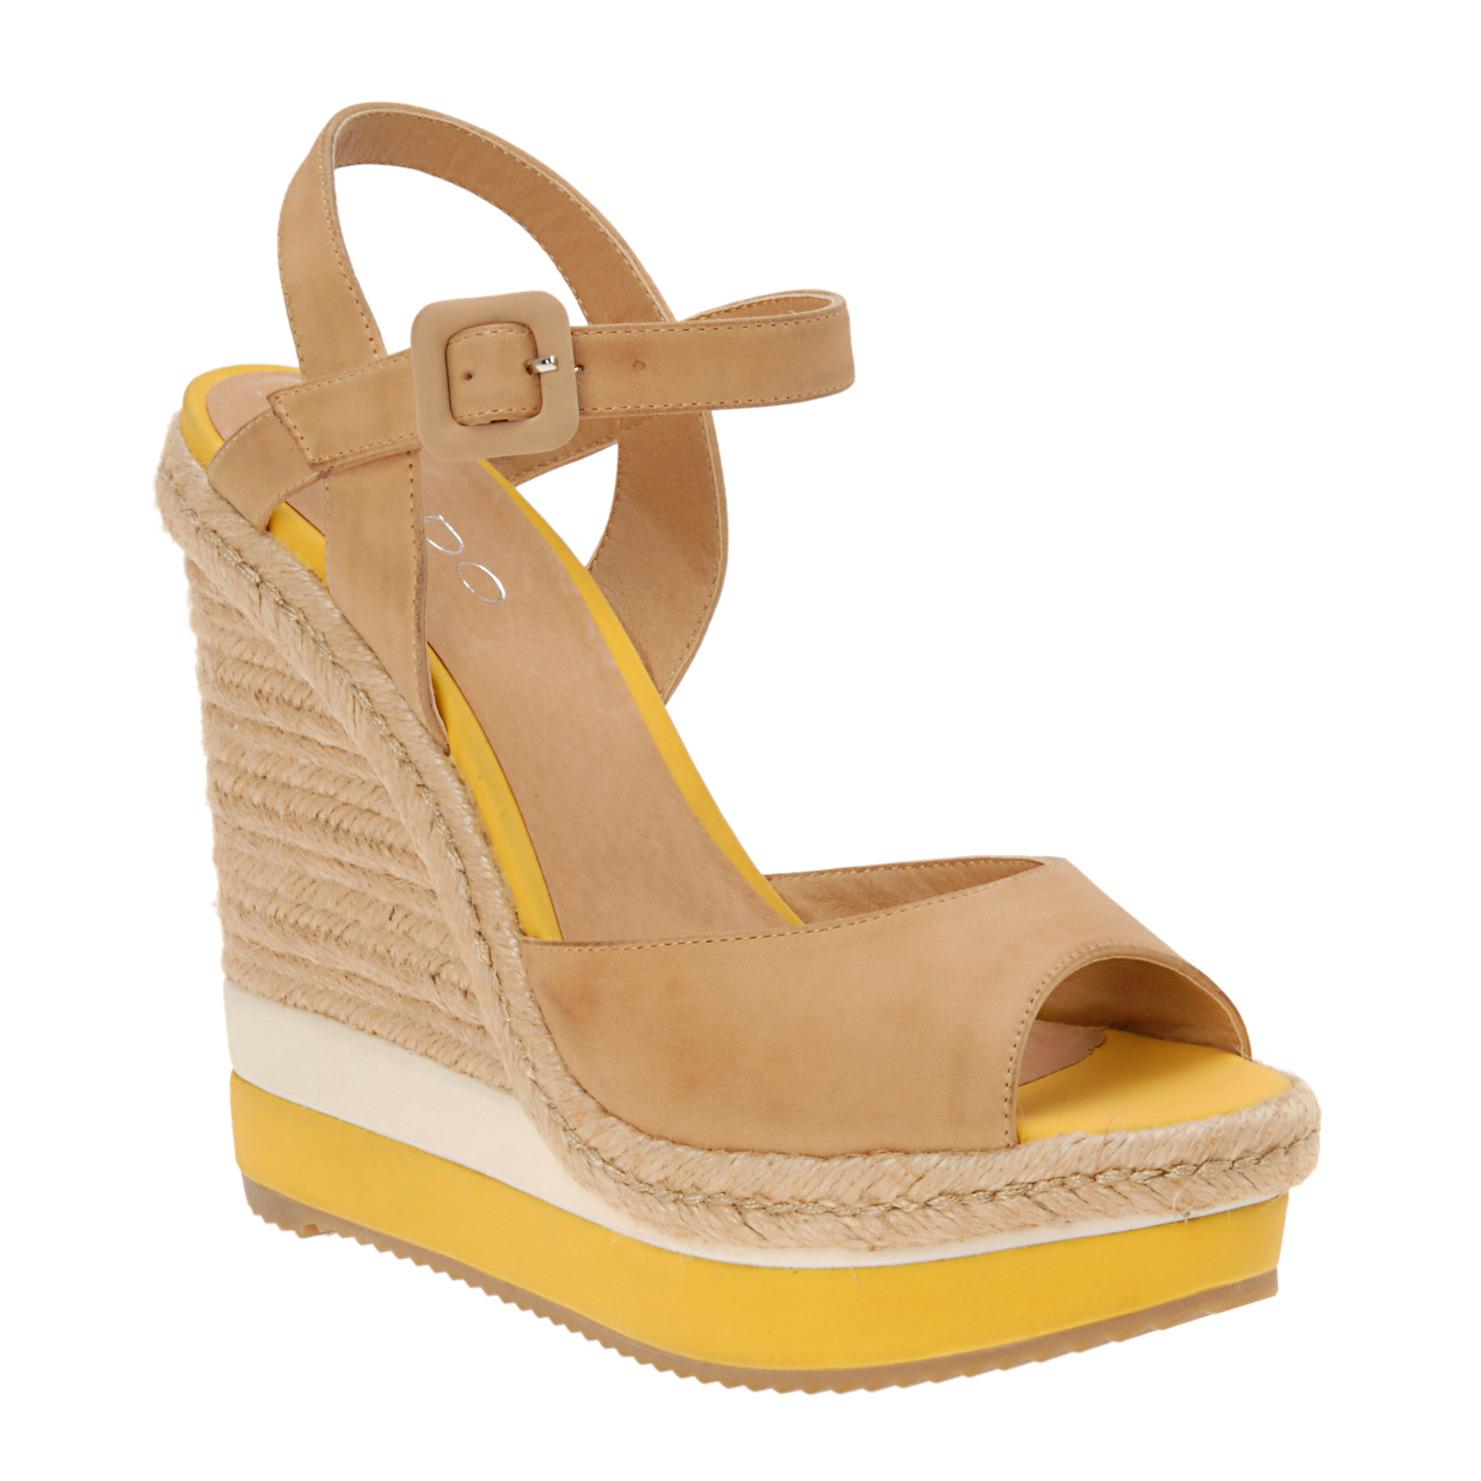 roxana banana shoe of the week aldo dyle wedges